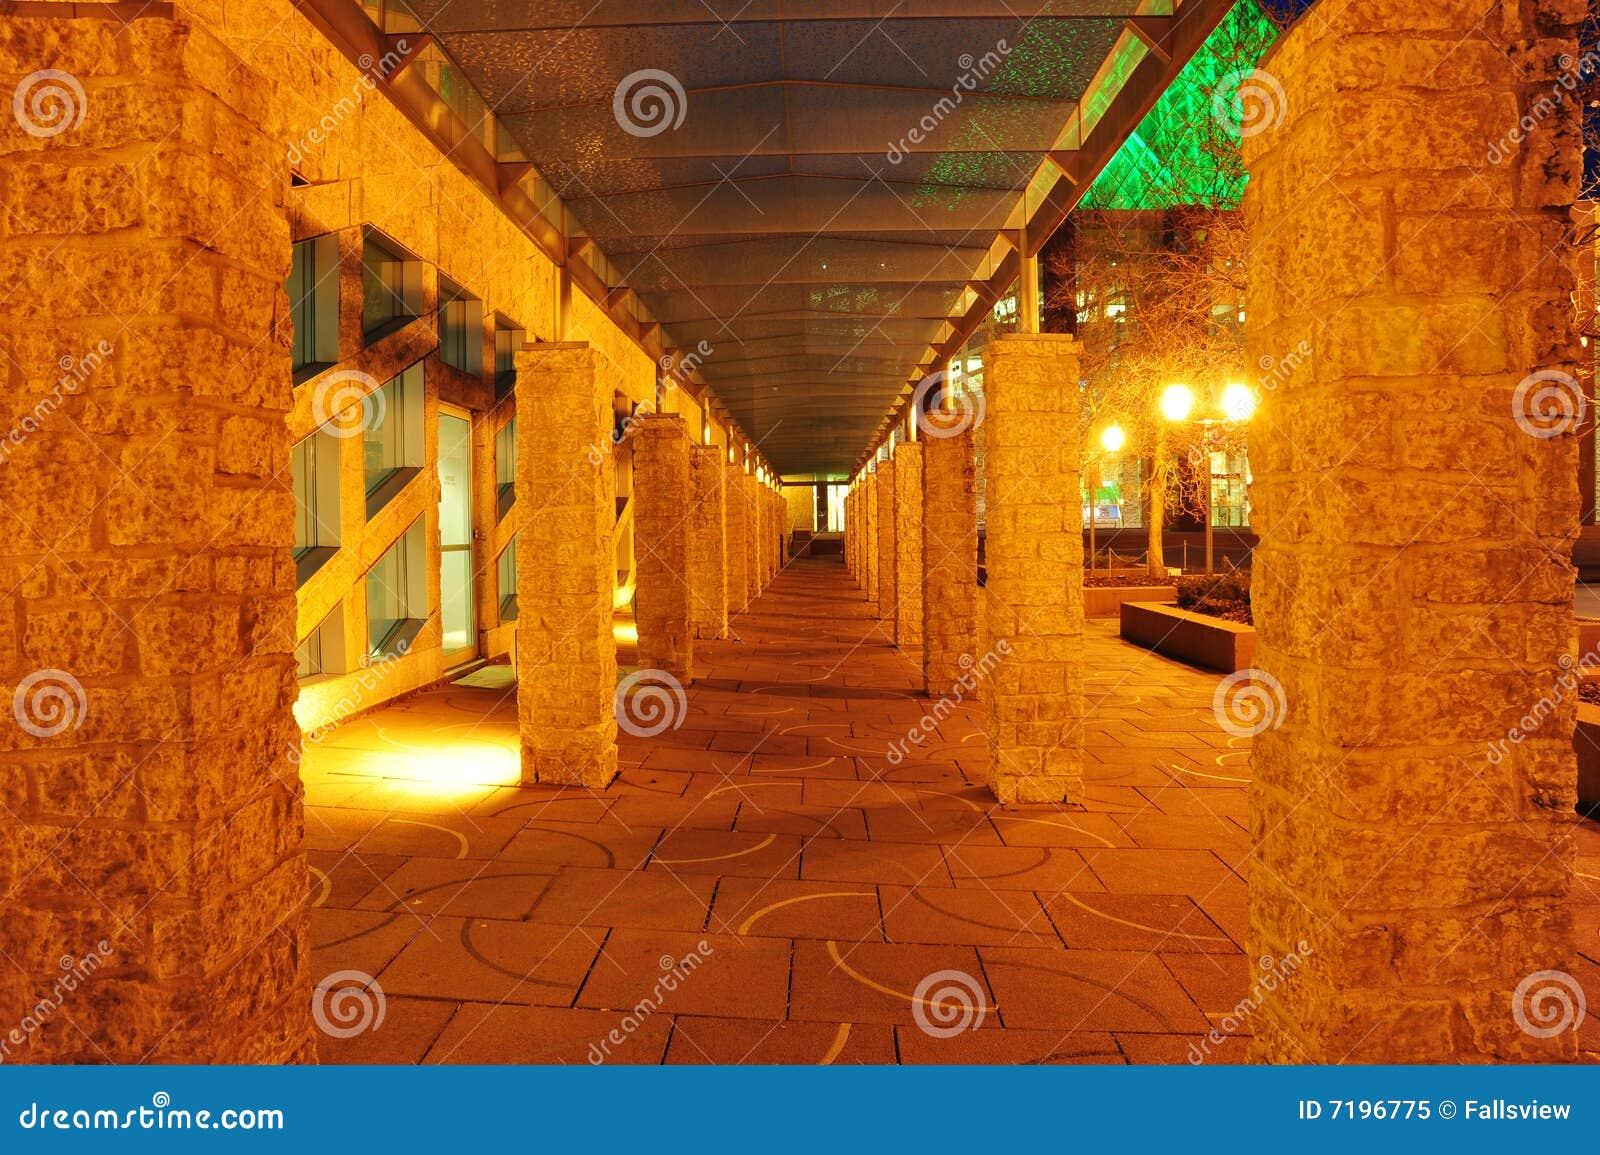 City corridor hall night scene